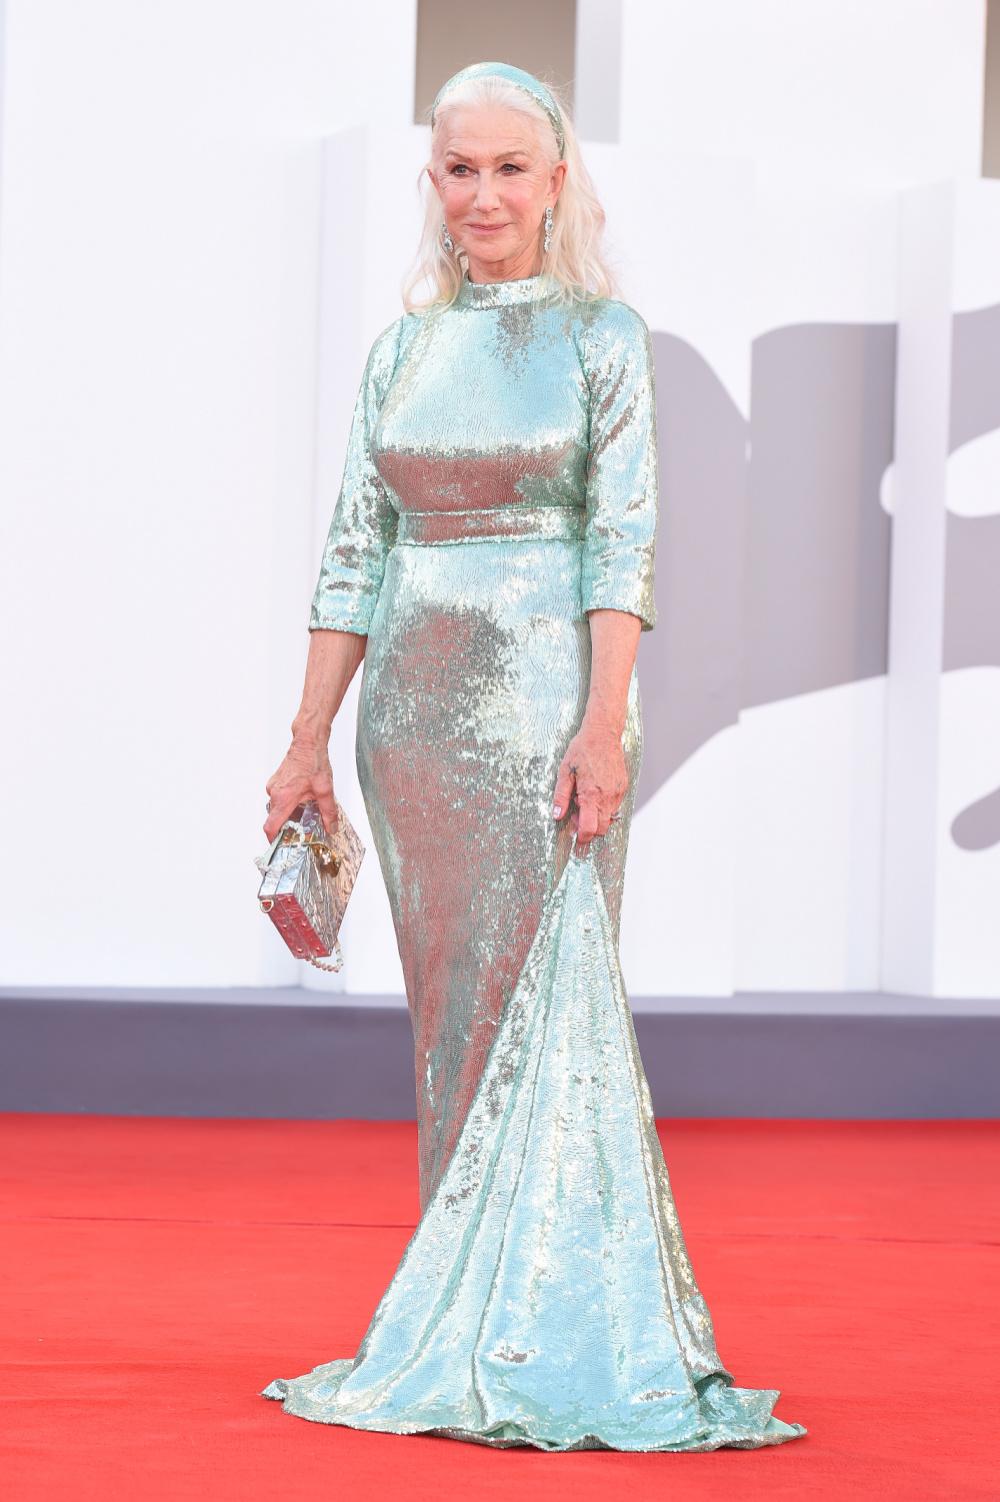 Helen Mirren wore a stunning Dolce and Gabbana gown at the Venice International Film Festival.